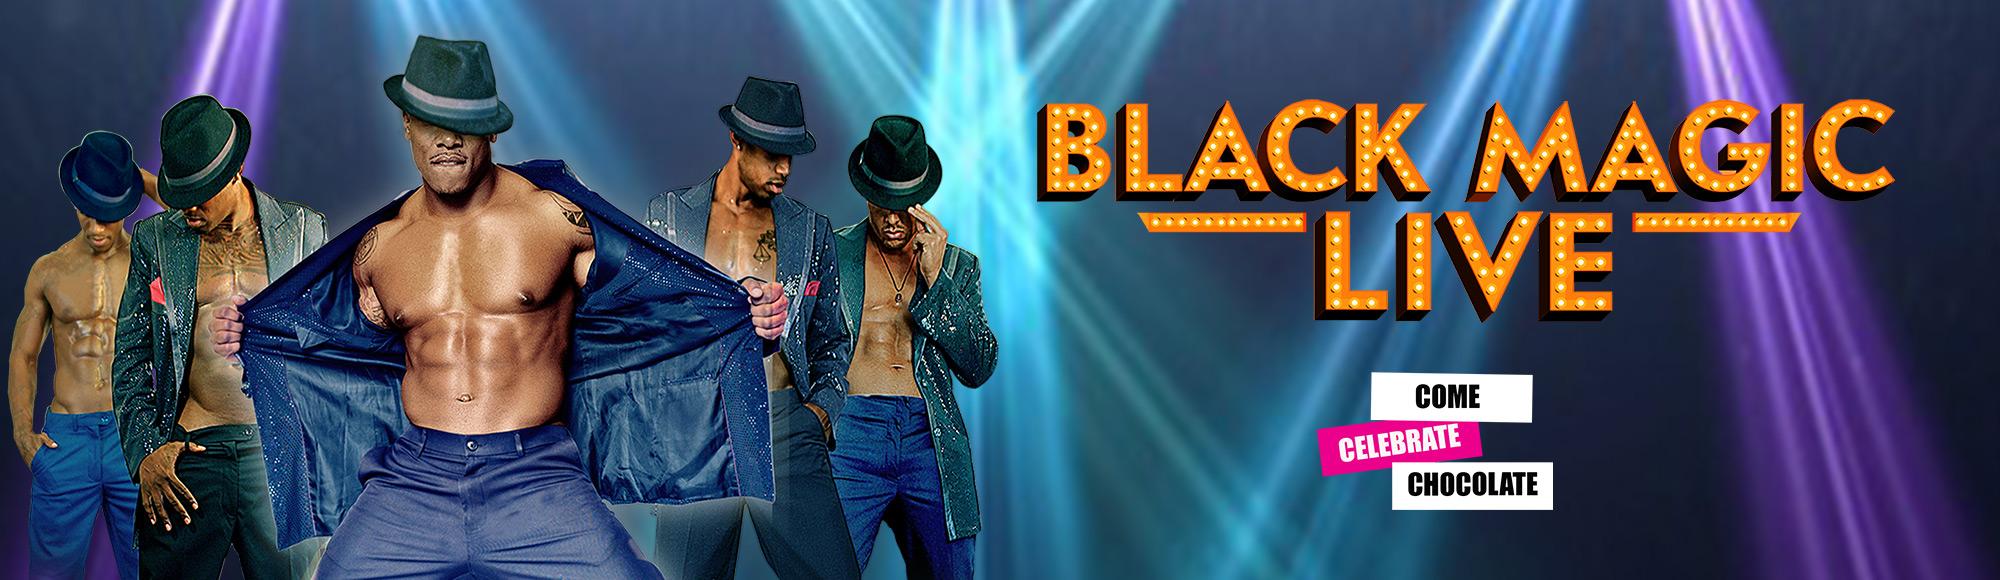 Black Magic Live show